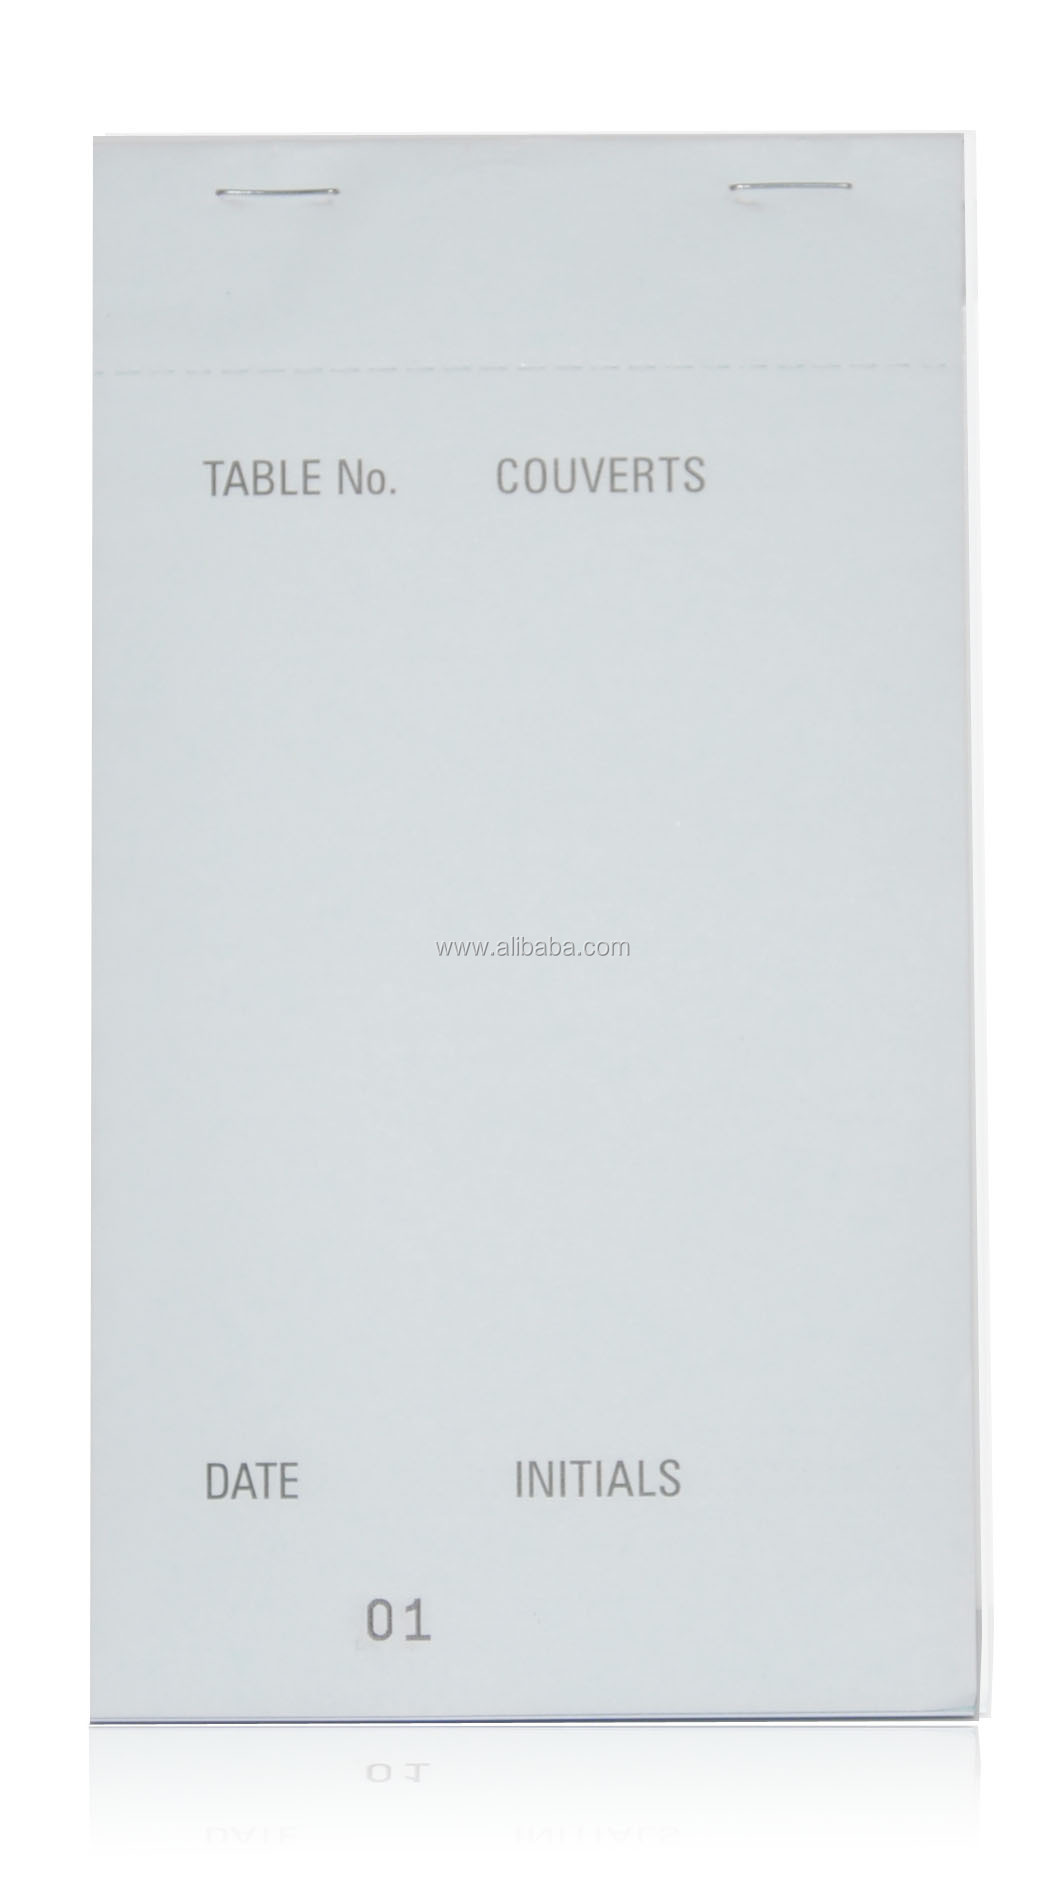 Guest Check Restaurant Waiter Pad Sales Books Invoice Books